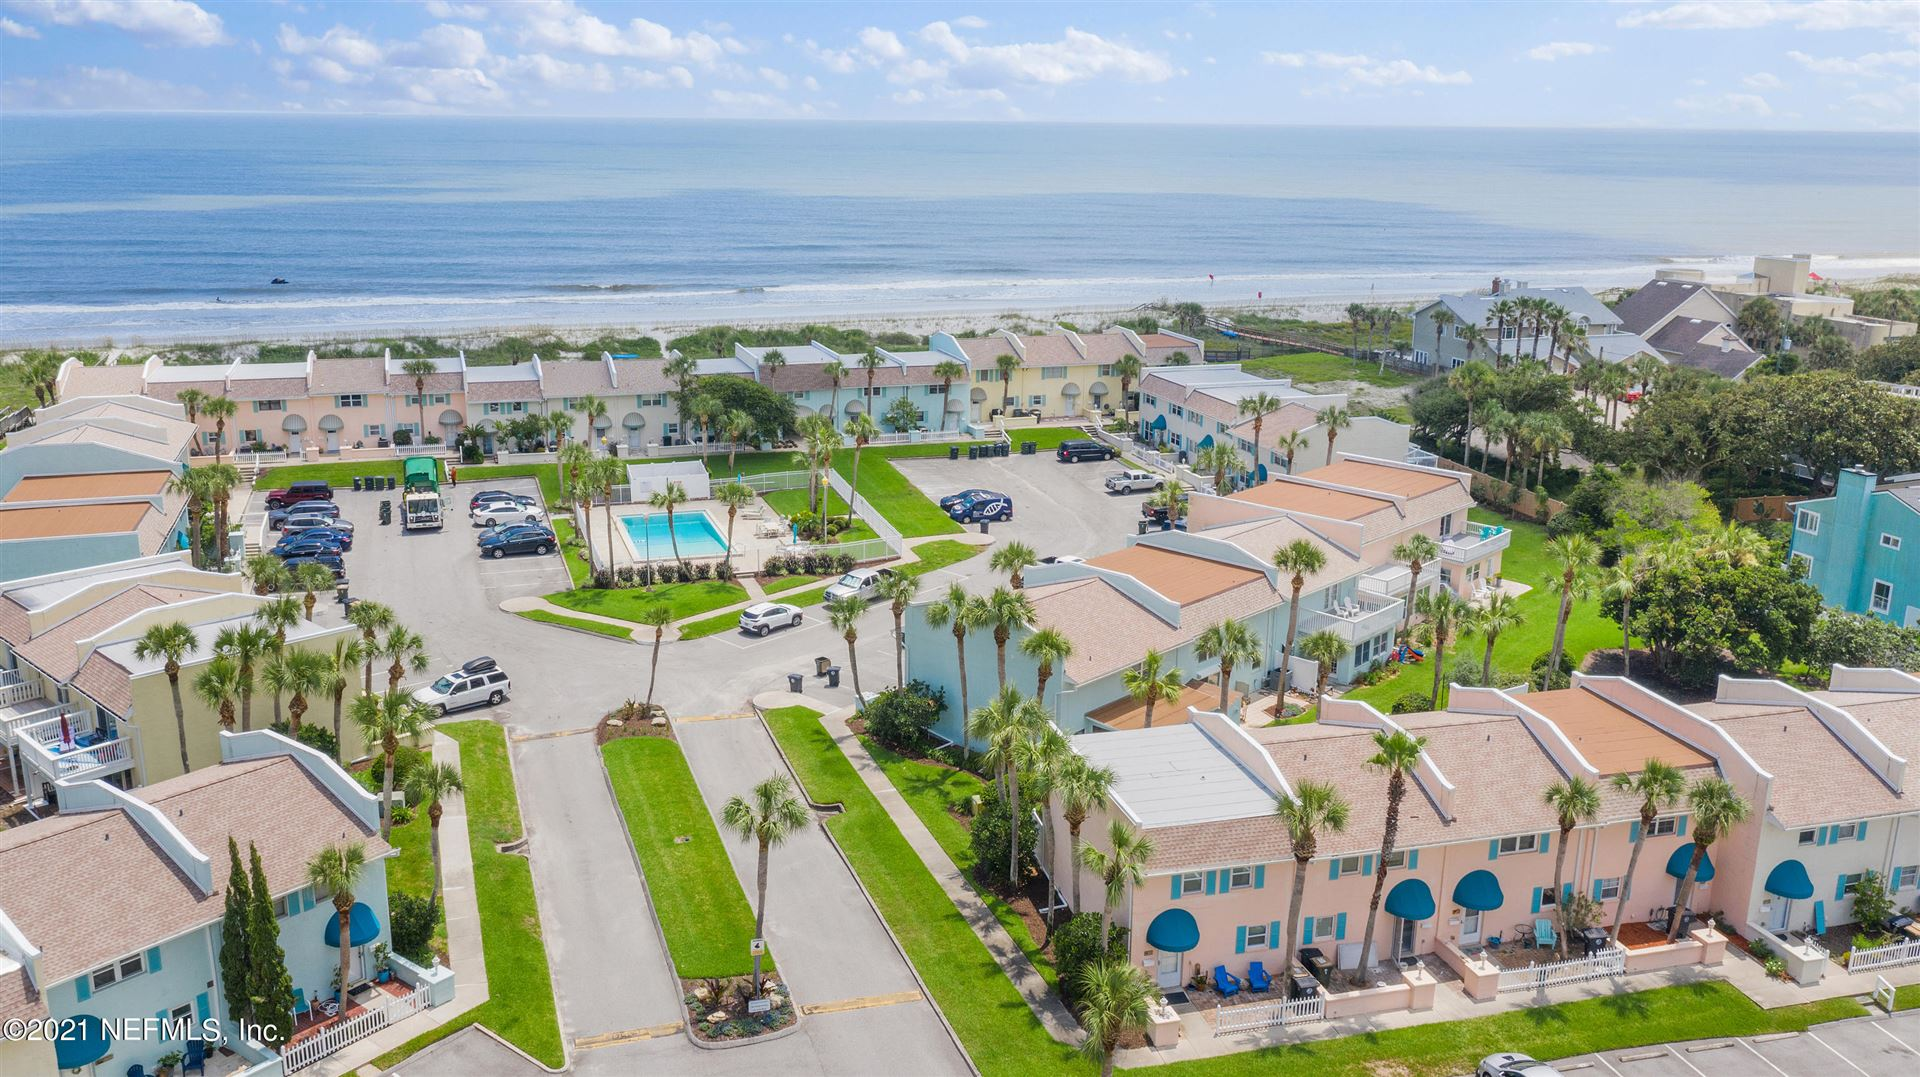 2233 SEMINOLE RD #Unit No: 26, Atlantic Beach, FL 32233 - MLS#: 1123285